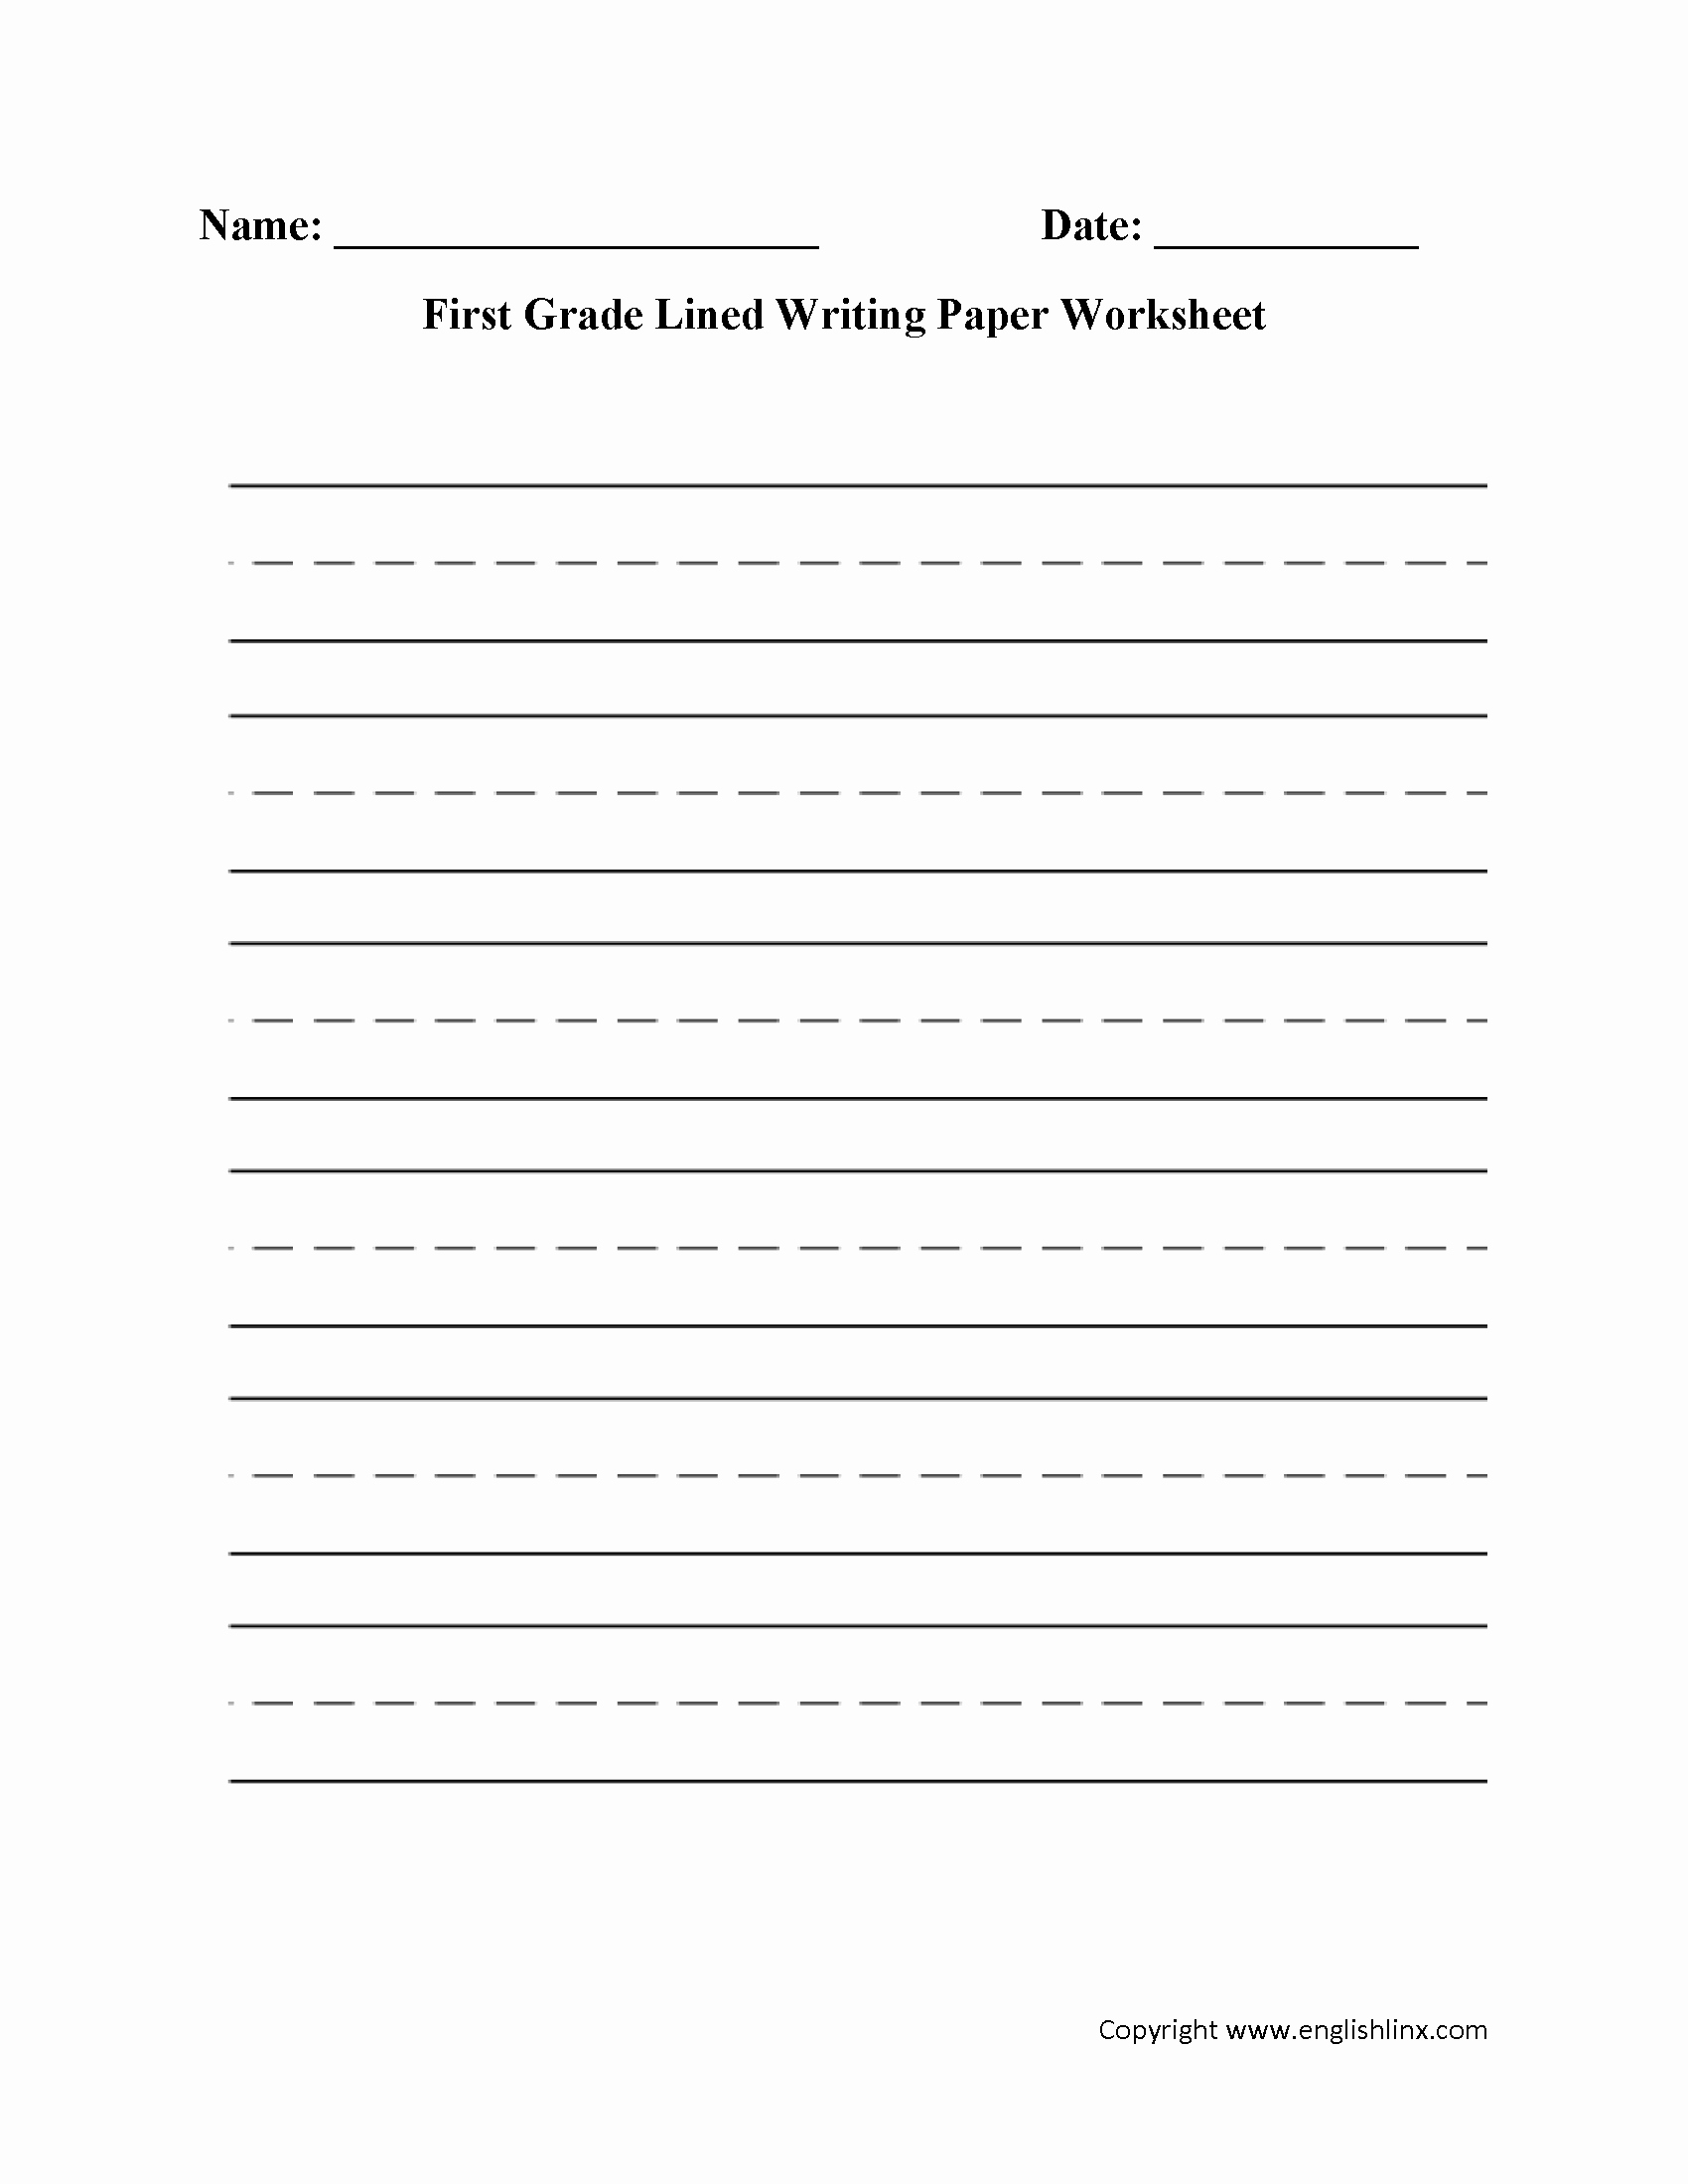 Writing Worksheet 1st Grade New Writing Worksheets